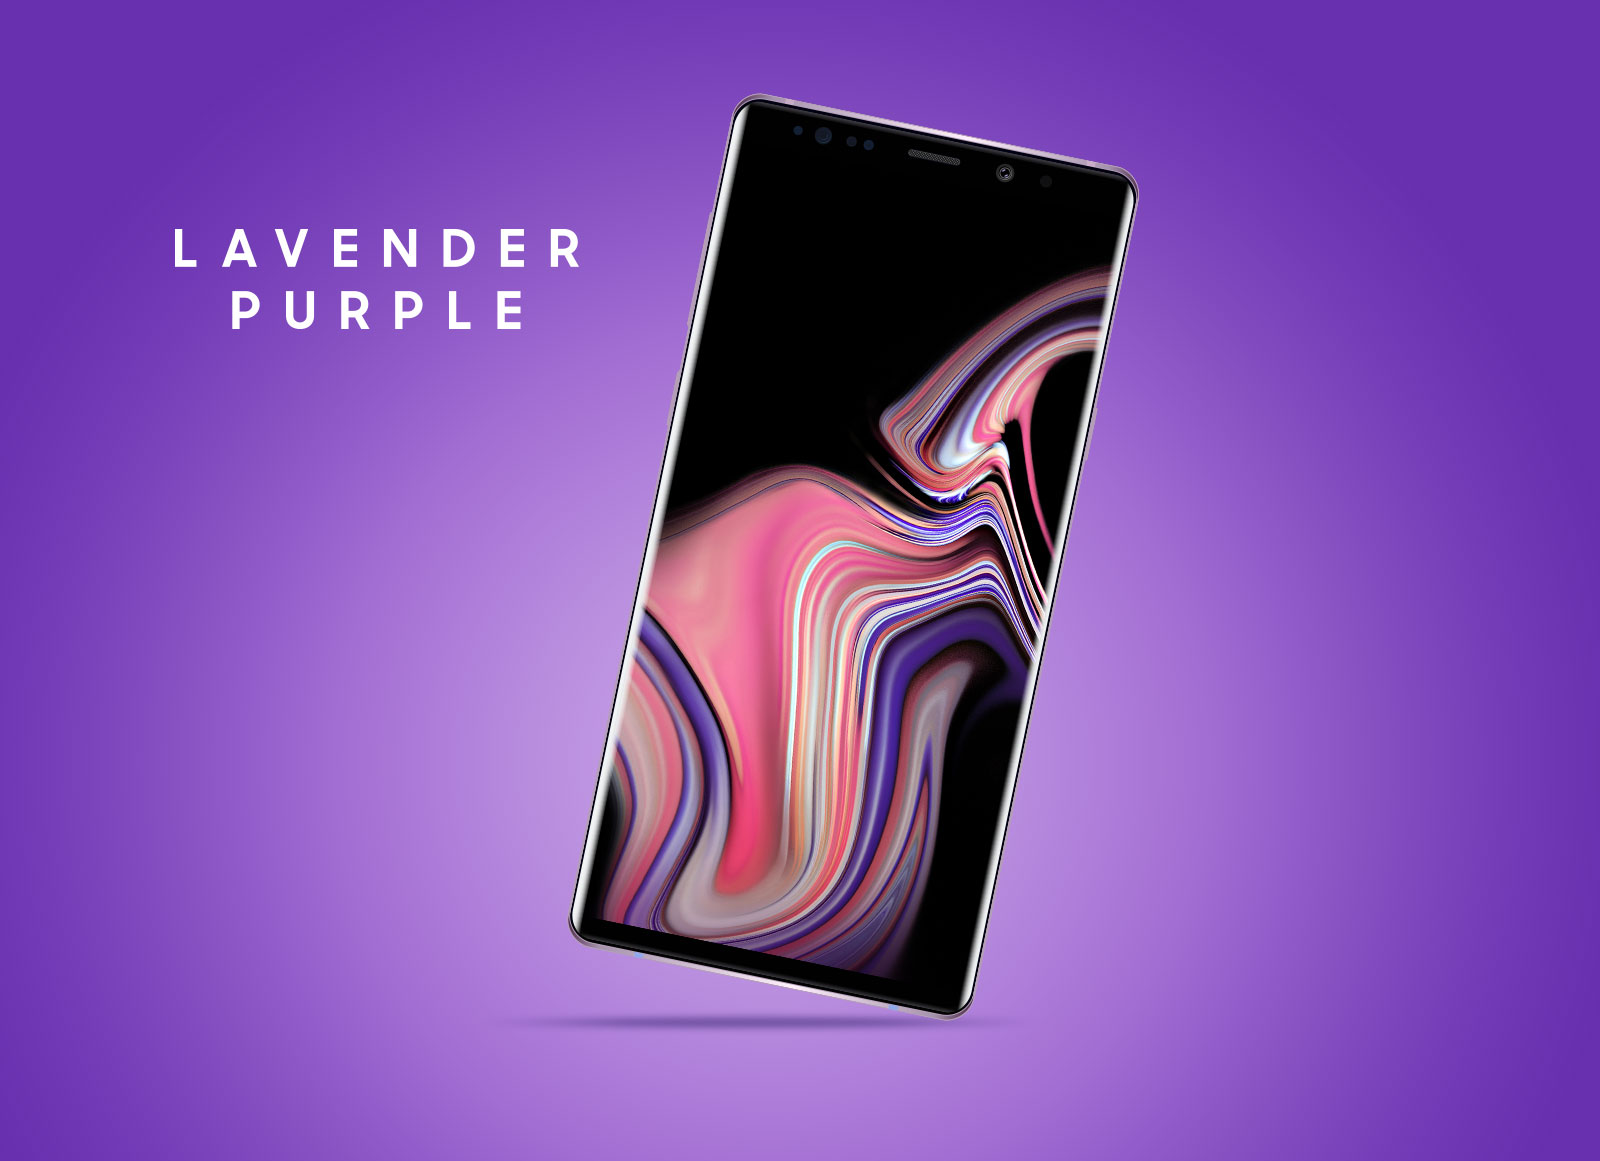 Free-Samsung-Galaxy-Note-9-Mockup-PSD-Lavender-Purple-Color